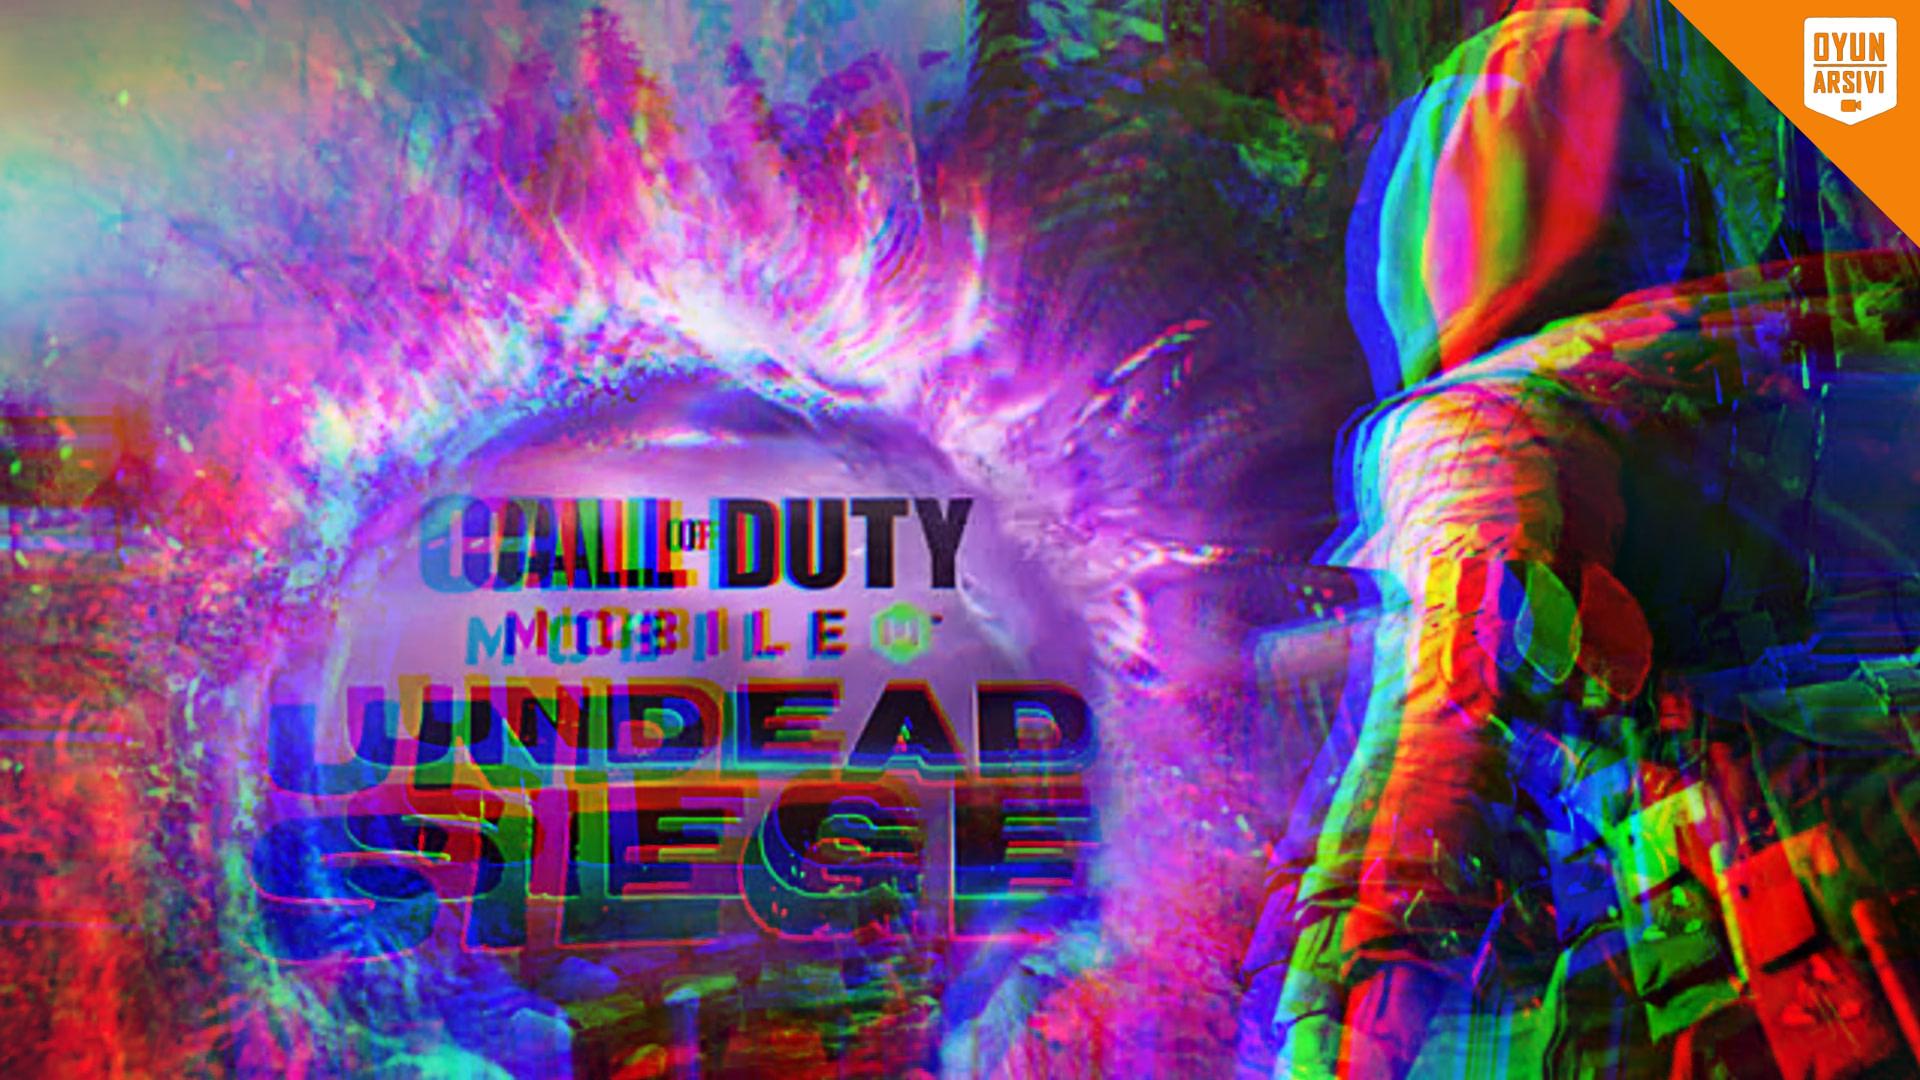 Call Of Duty Mobile Yeni Zombi Modu_ Undead Siege Oyun Arşivi